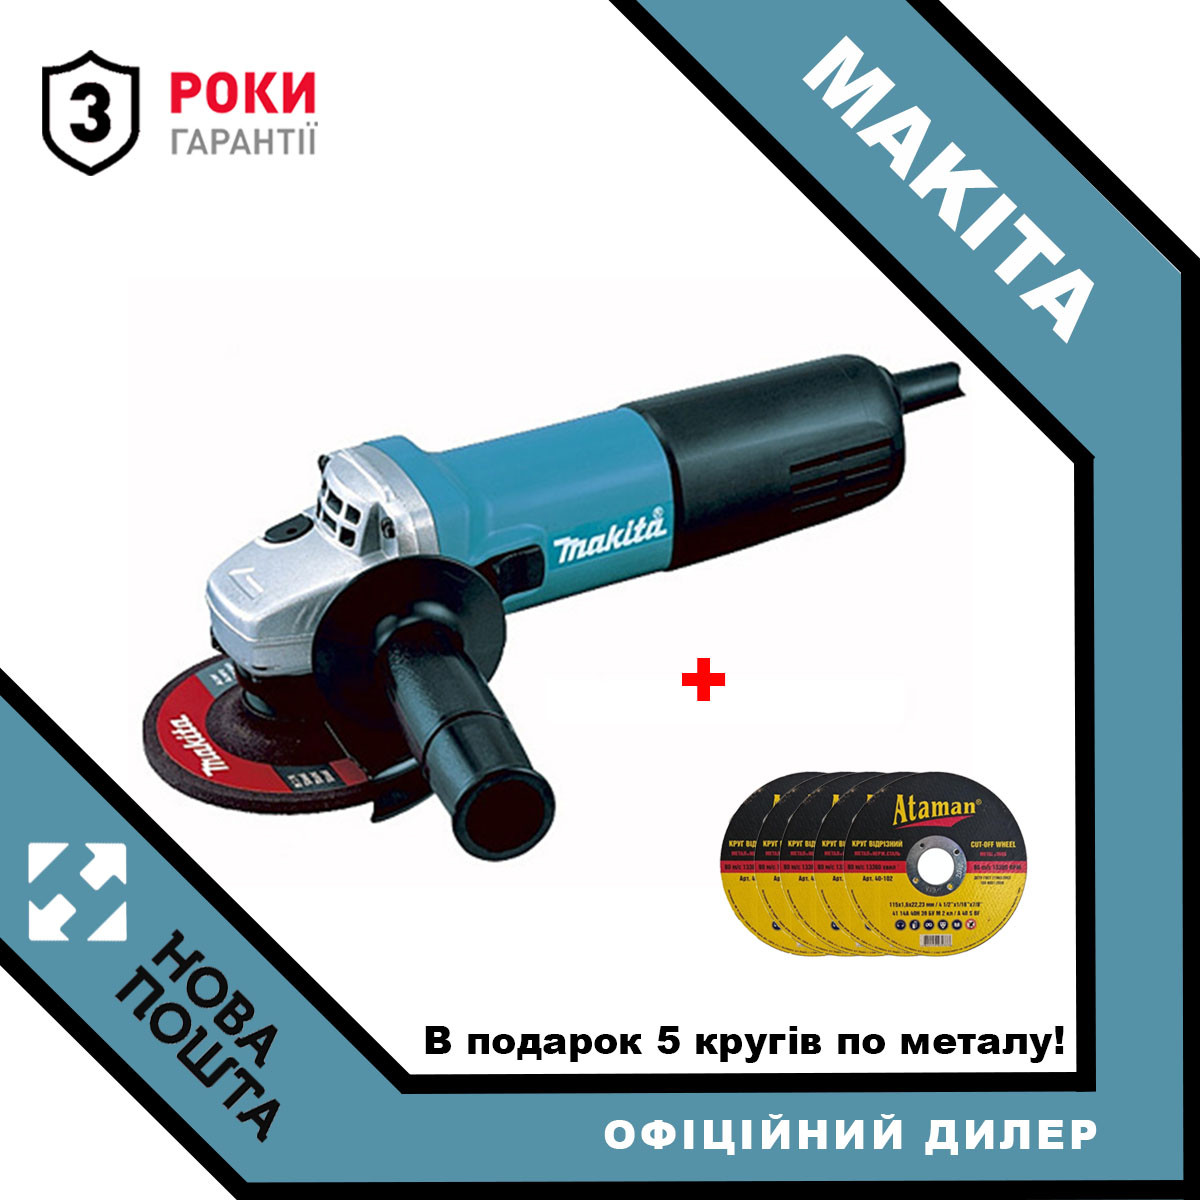 Болгарка MAKITA 9558HNG + в подарок 5 кругів по металу!